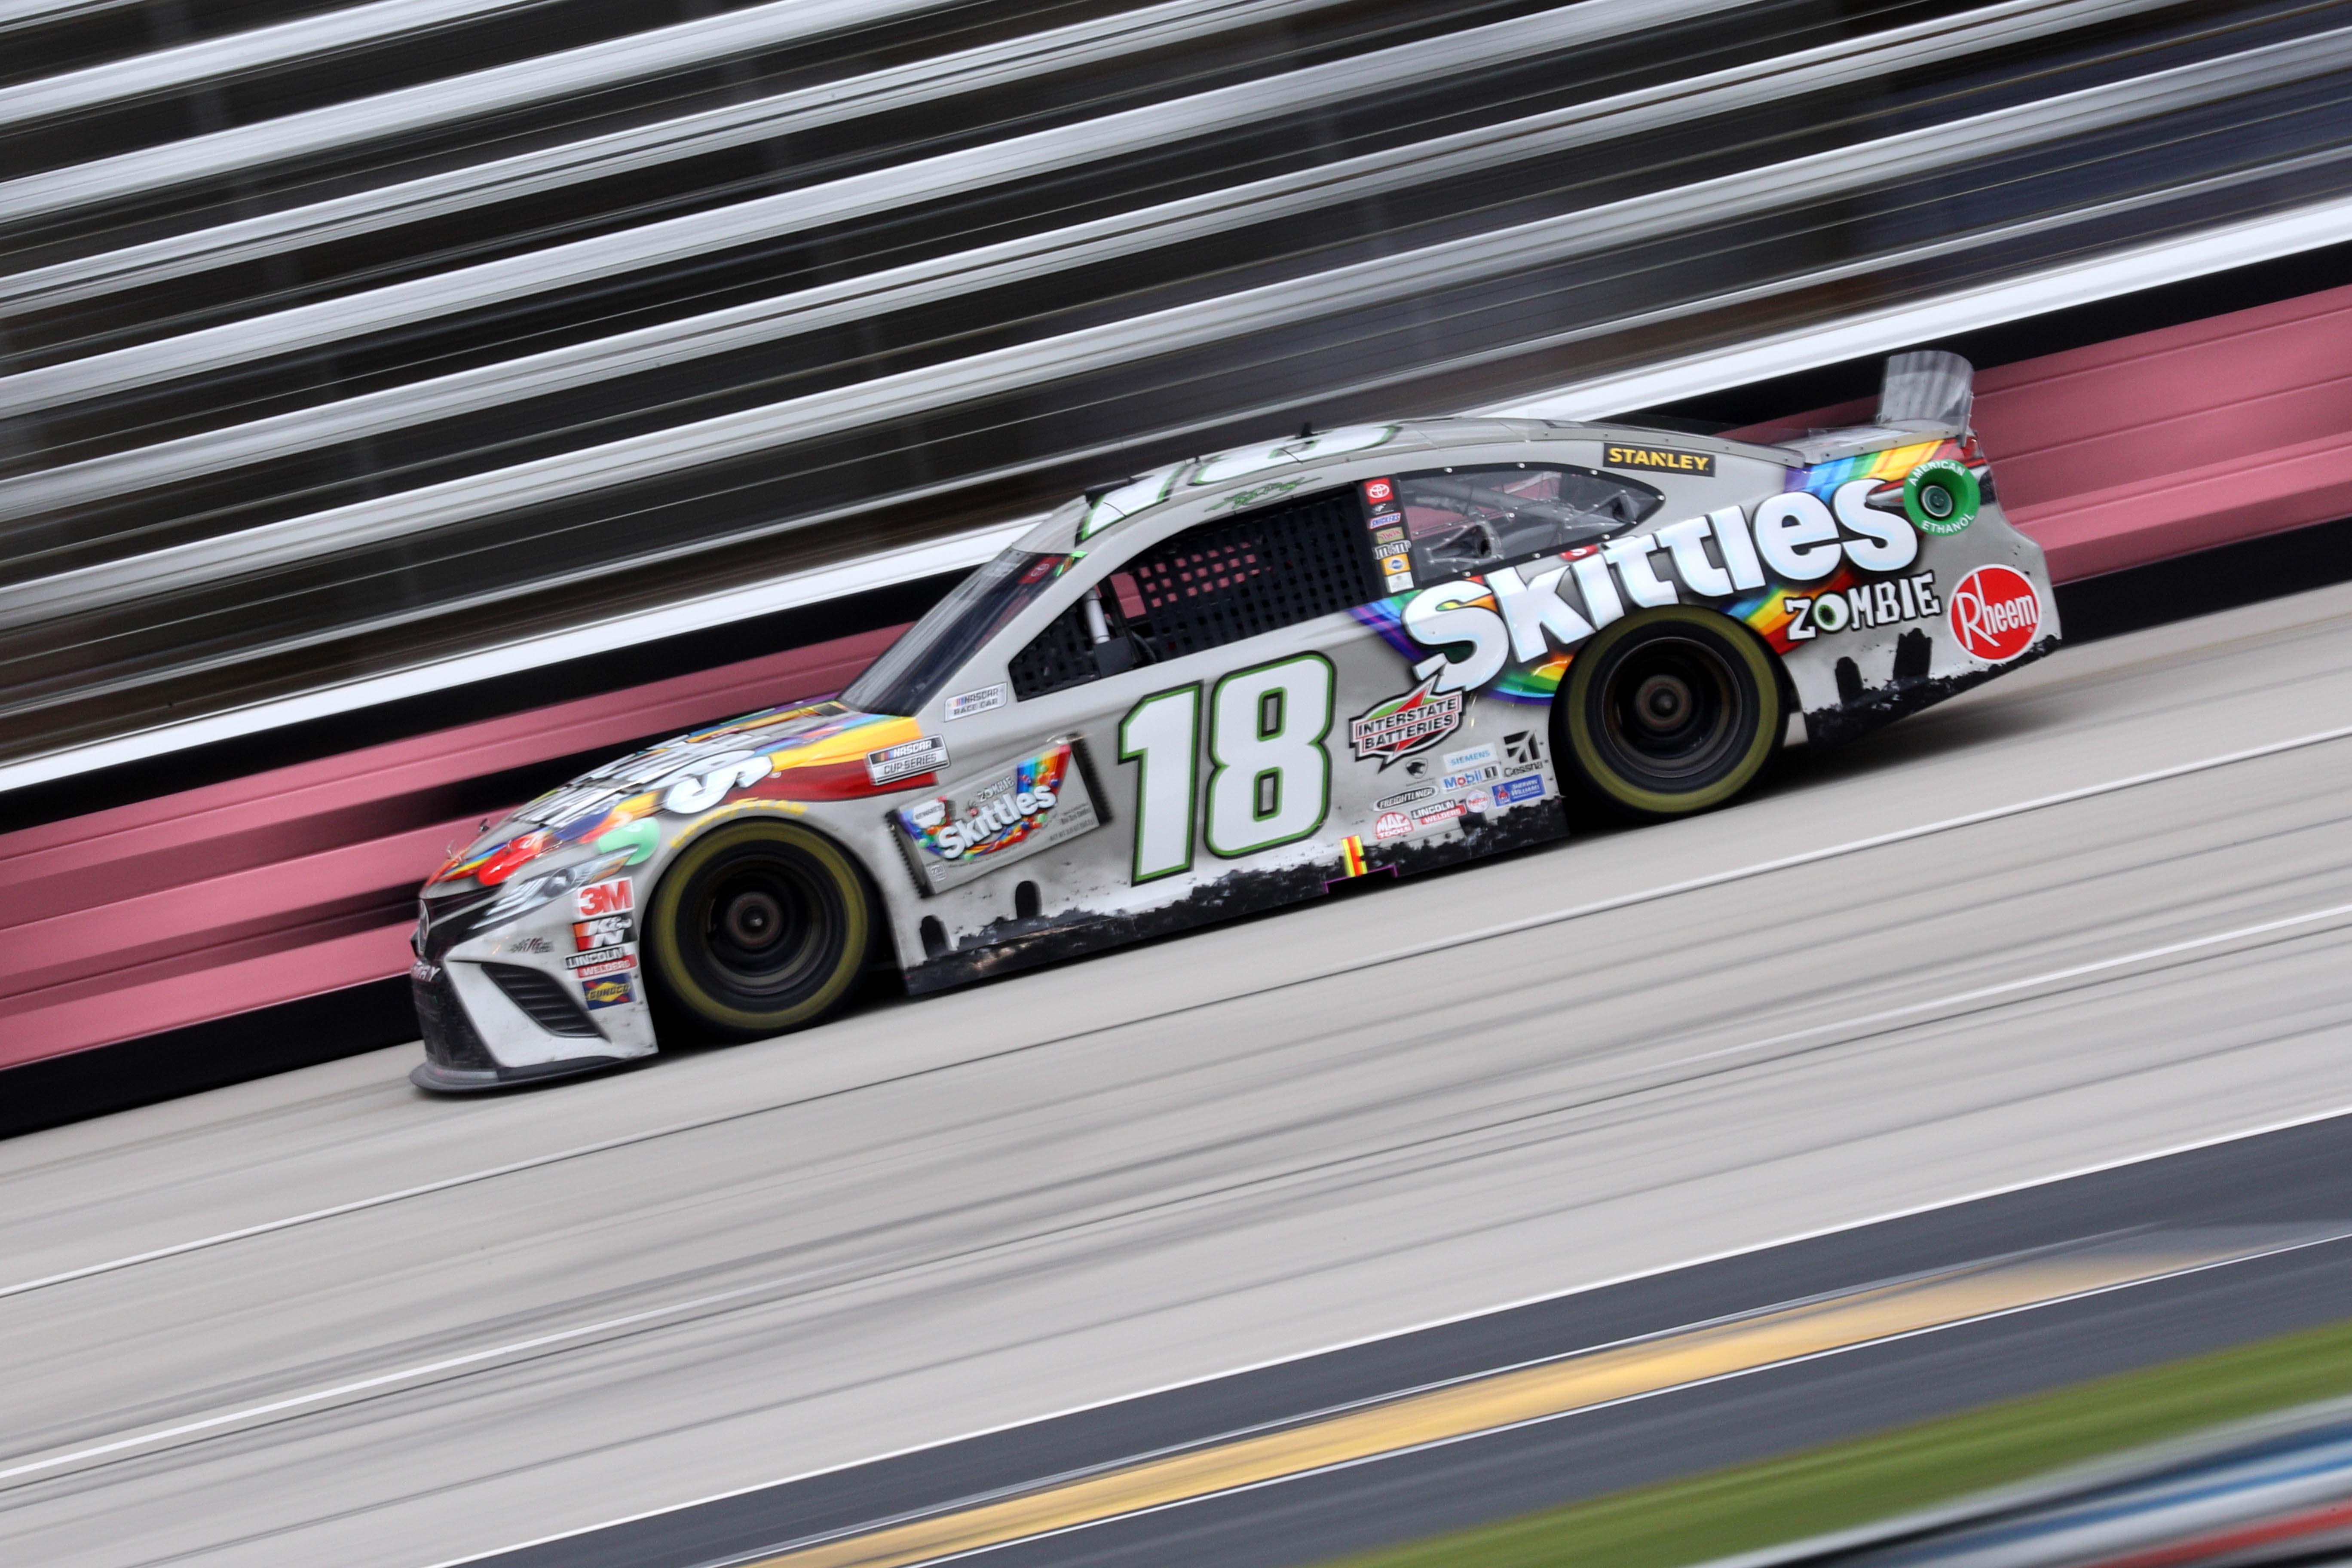 Kyle Busch - Skittles Zombie Paint Scheme - Texas Motor Speedway - NASCAR Cup Series